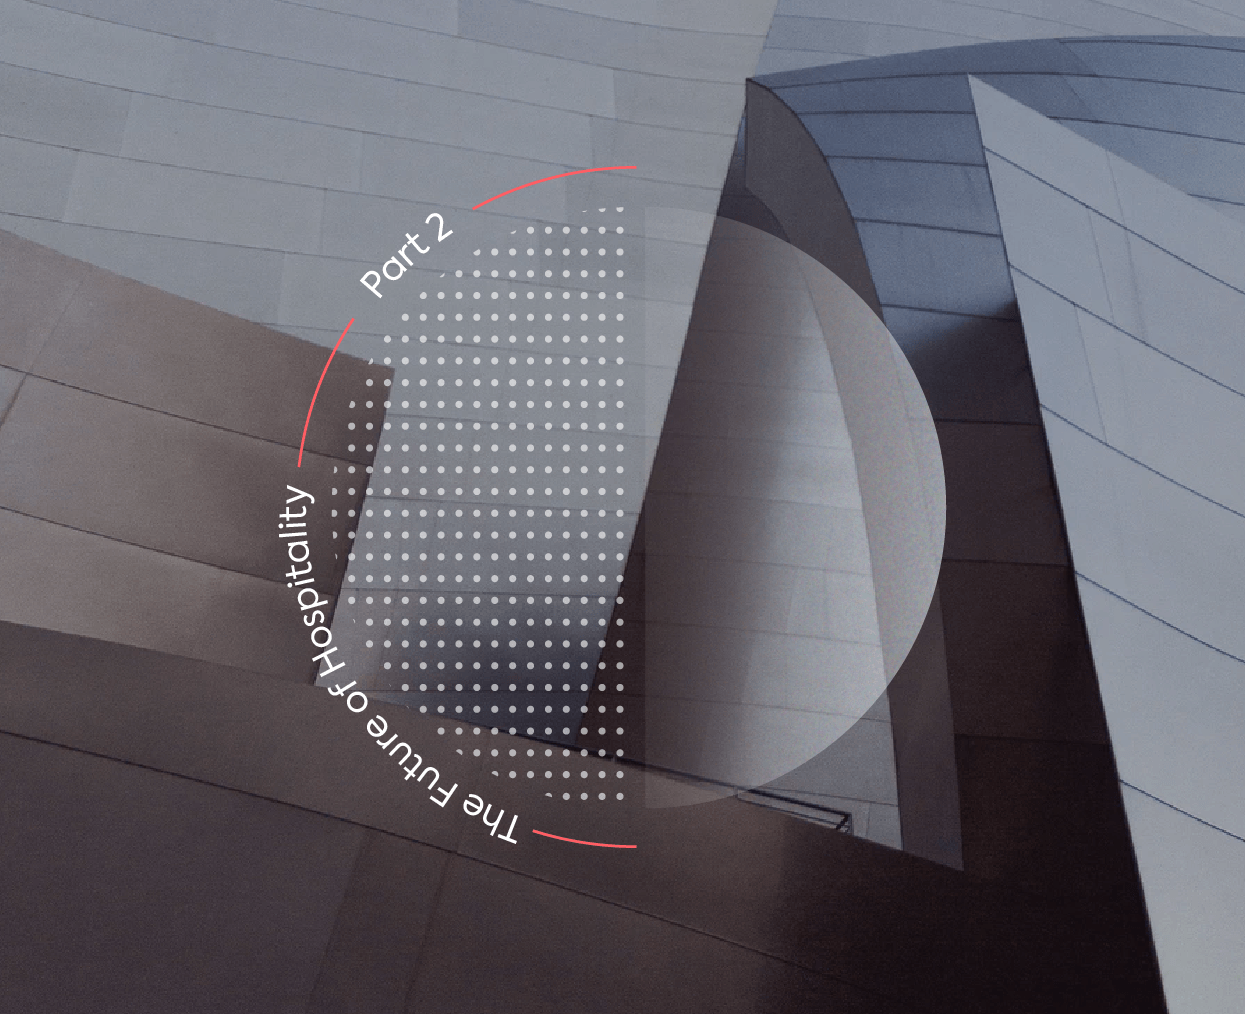 Rethinking Hotel Data webinar hero image